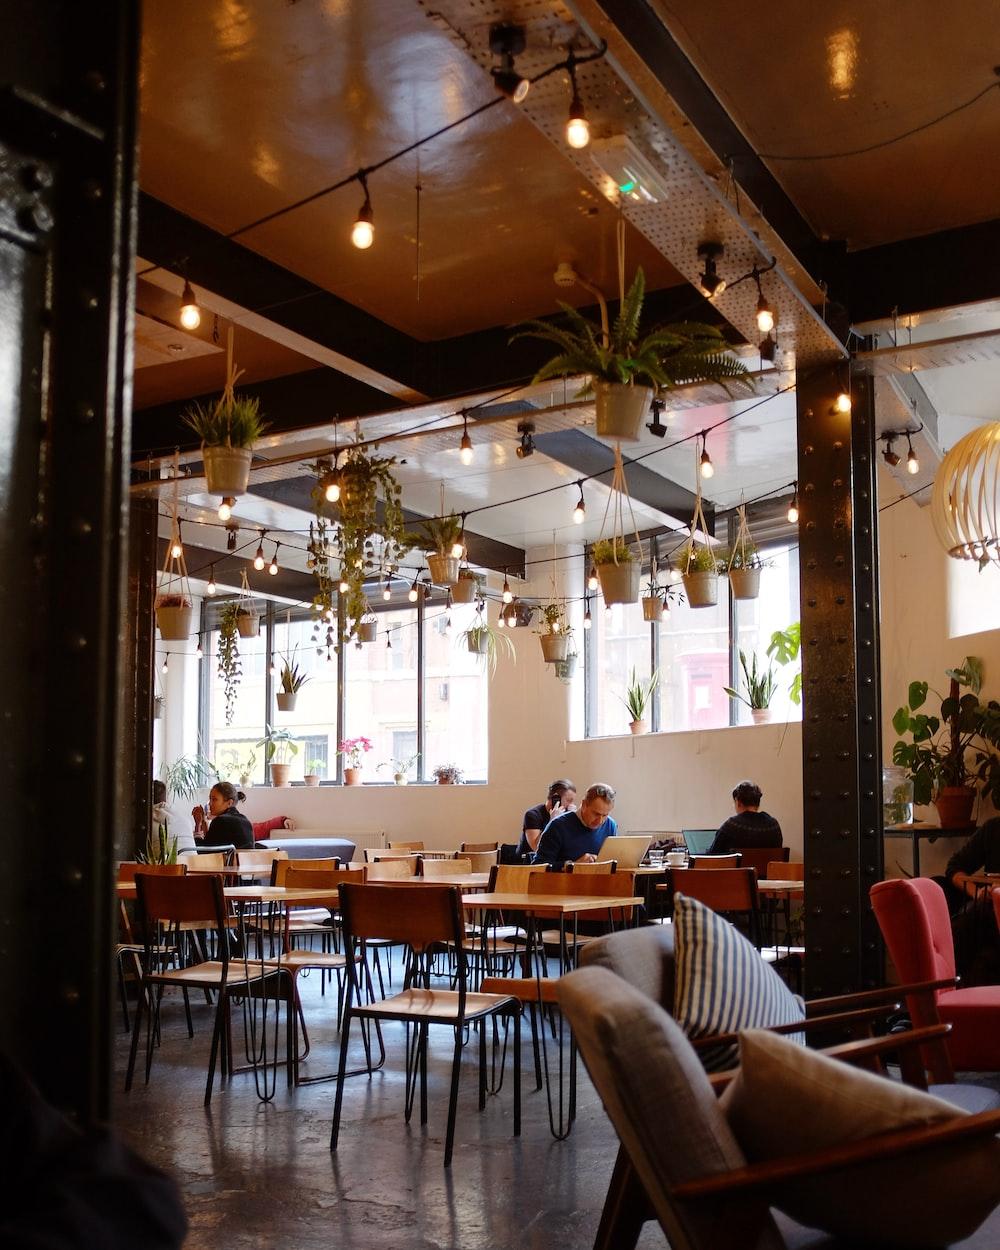 people inside restaurant during daytime